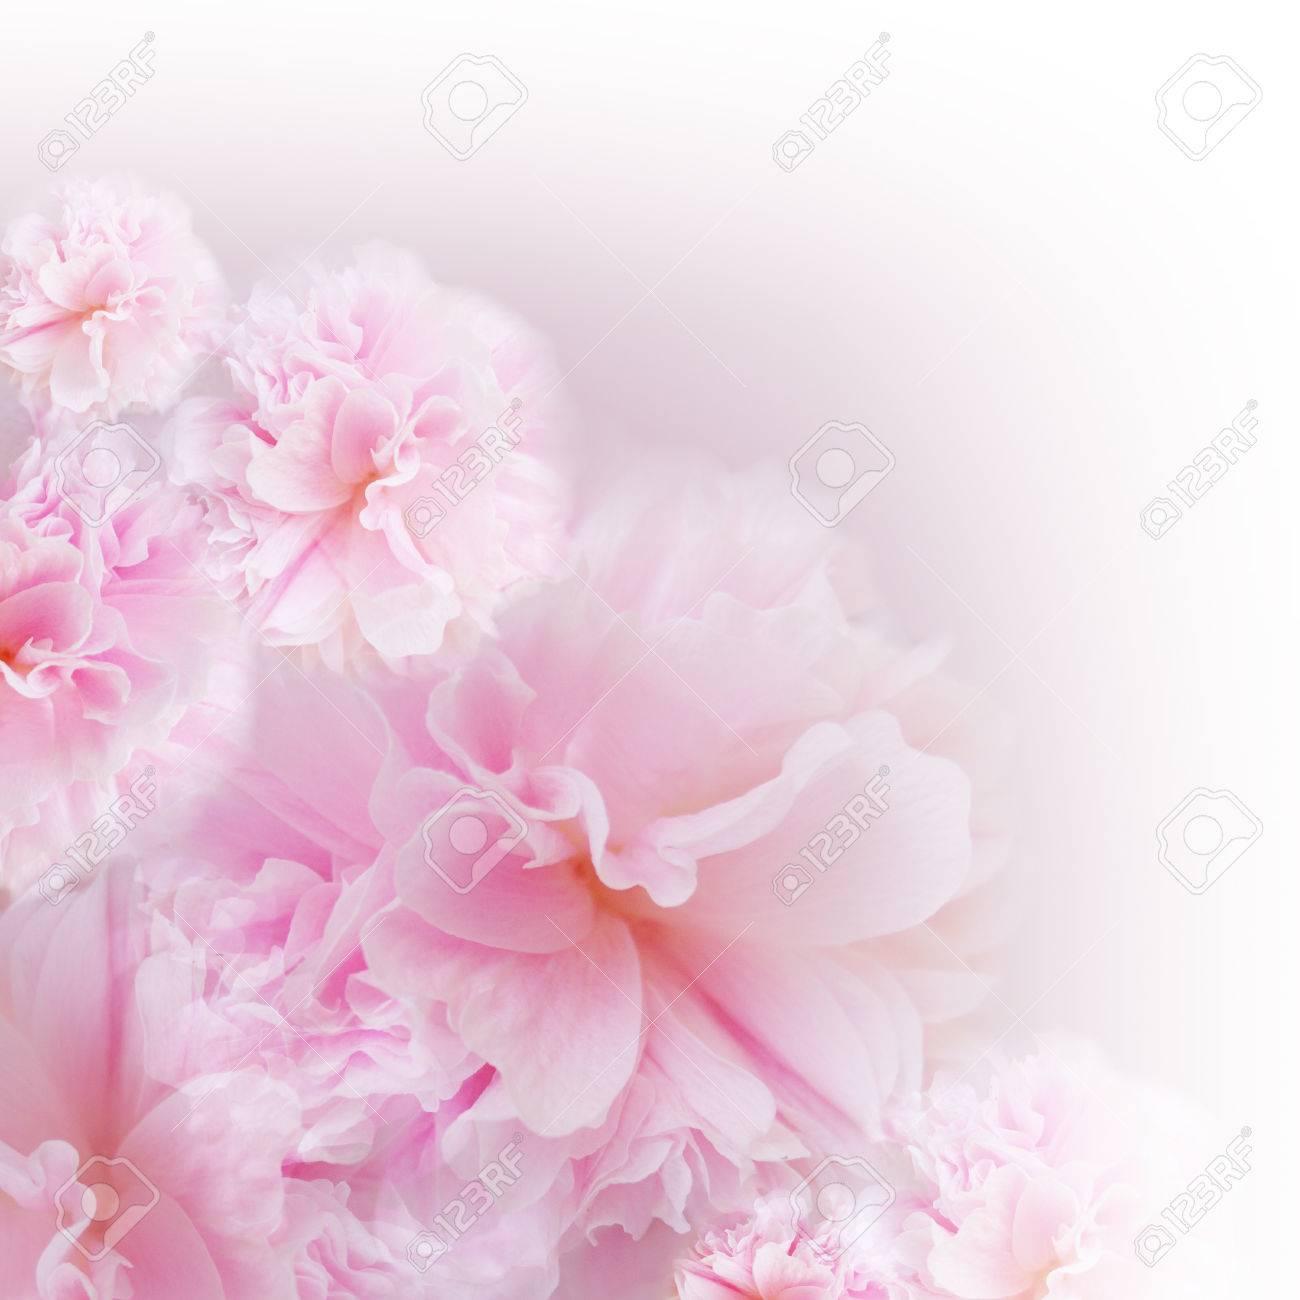 Pink flower on soft pastel color in blur style. Blossom - pink flower, floral background. Pink background. - 75527895